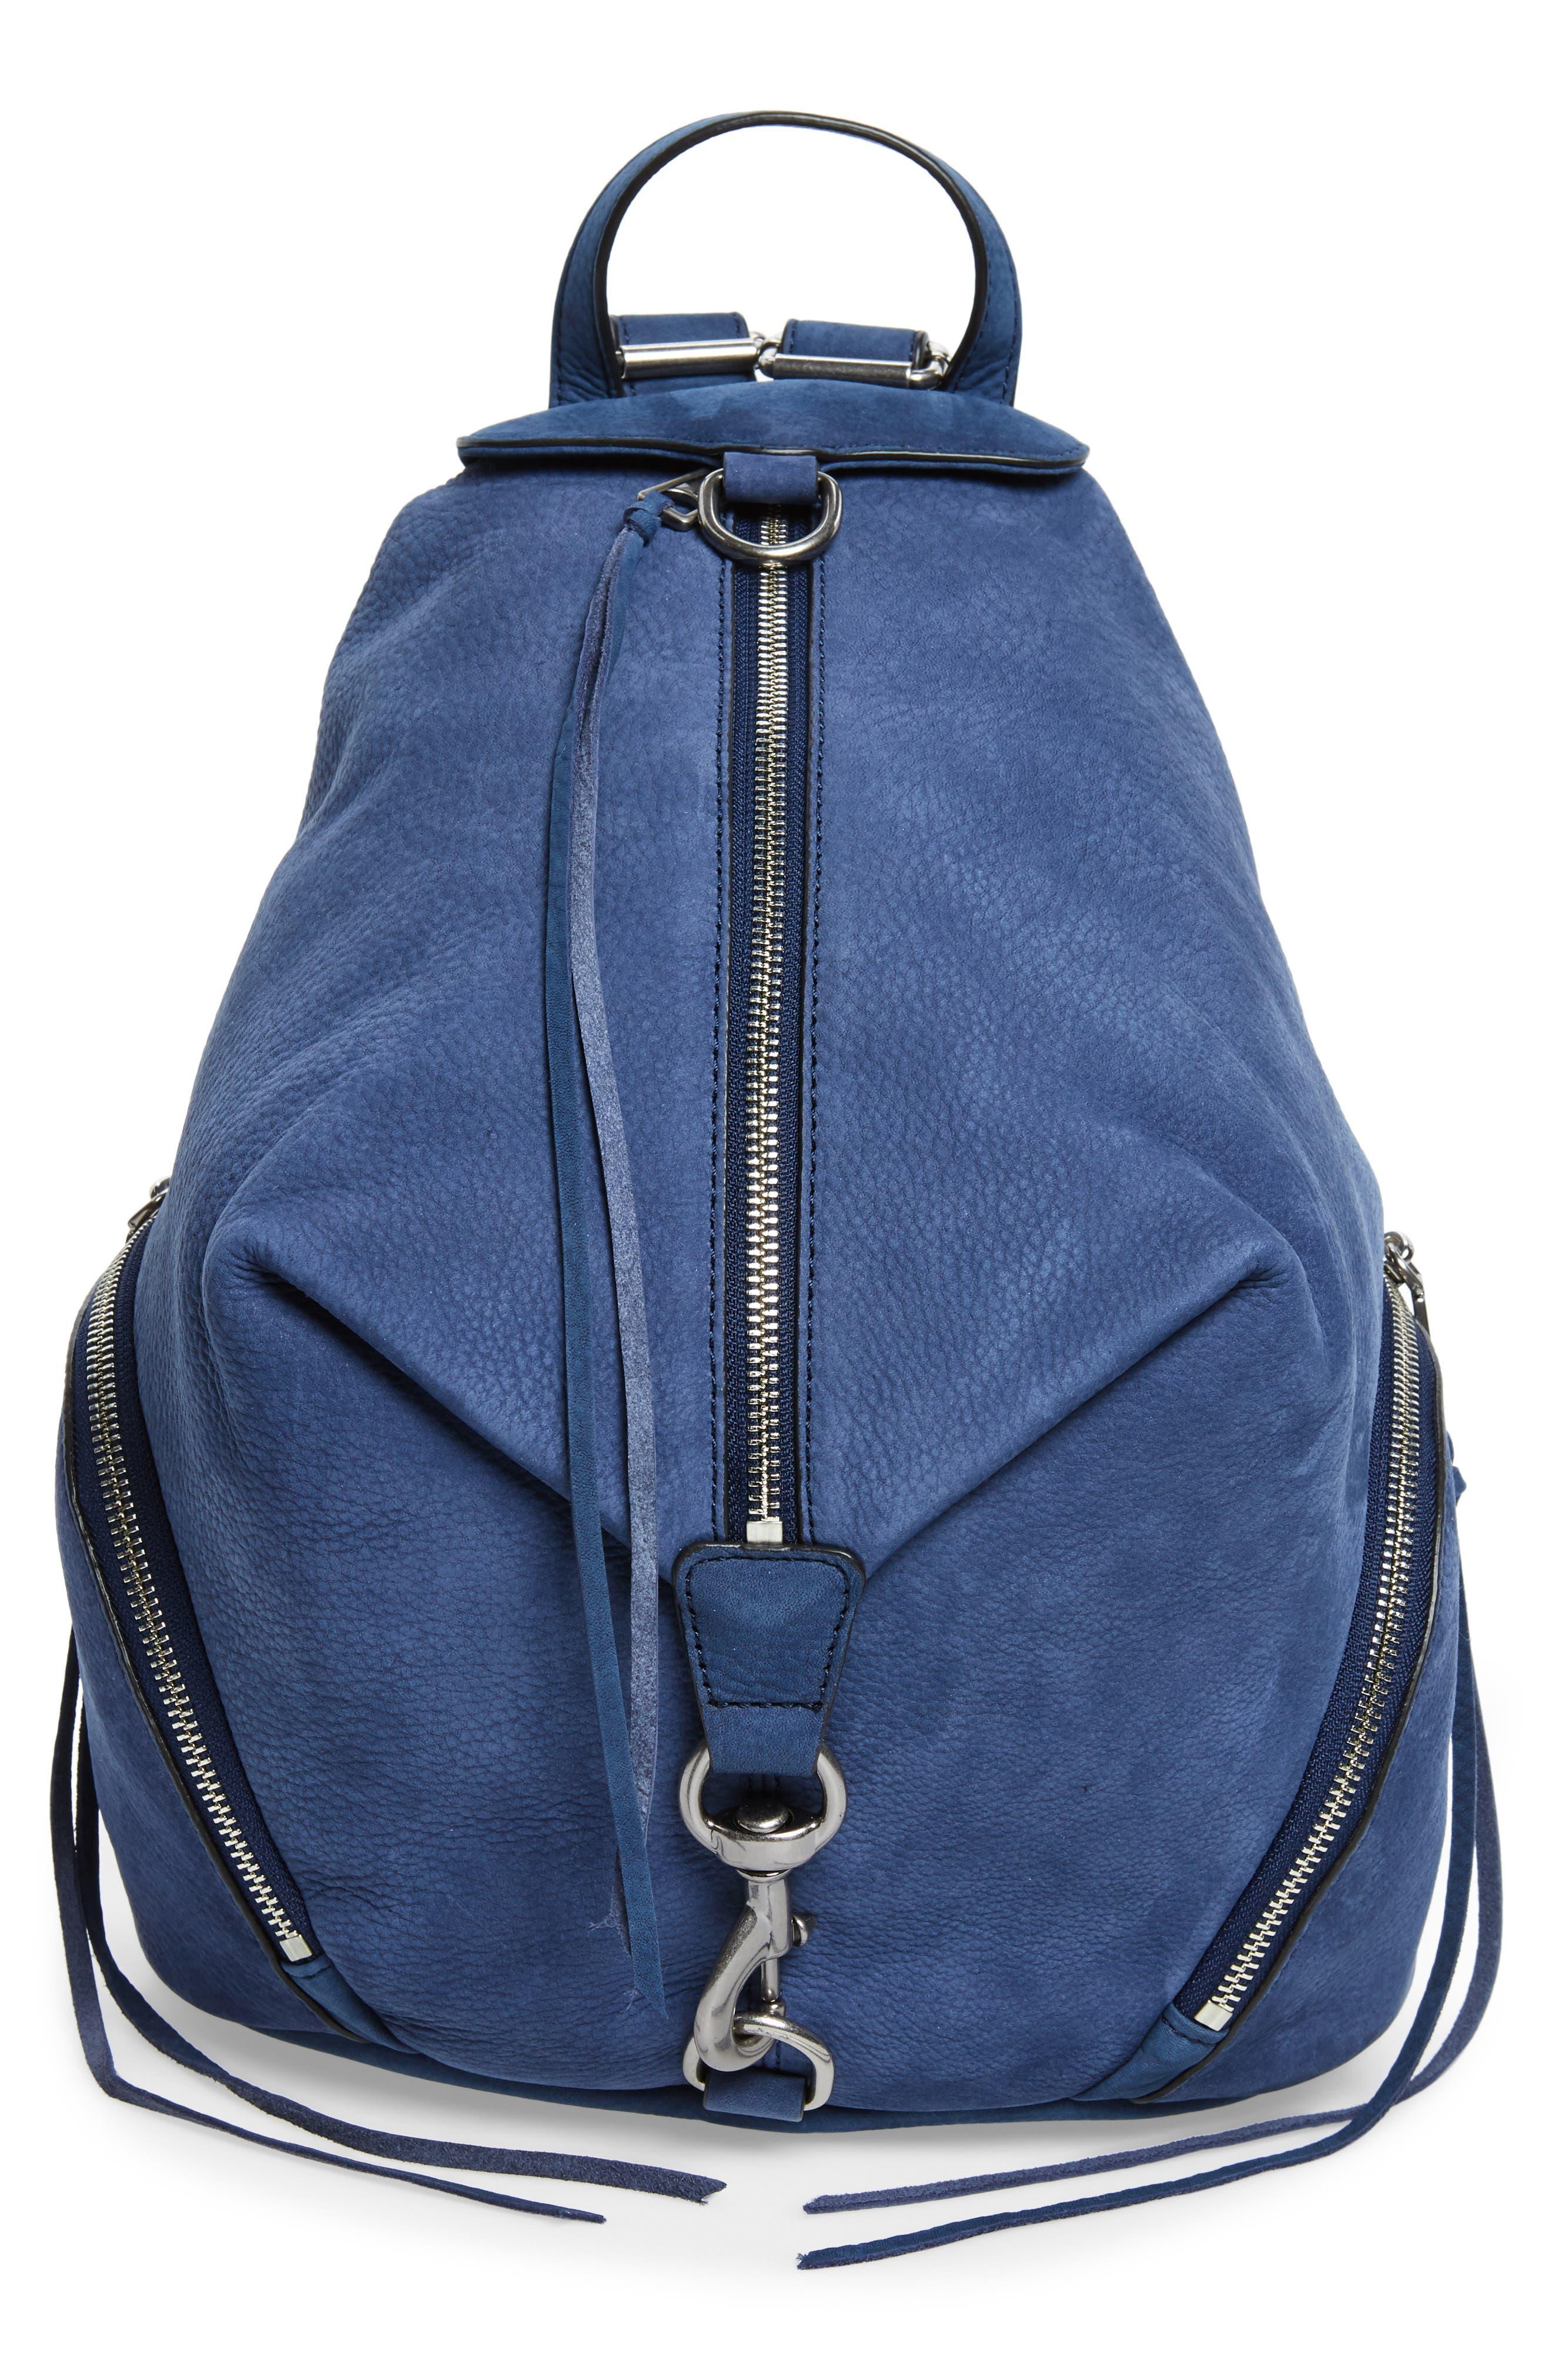 Alternate Image 1 Selected - Rebecca Minkoff Julian Convertible Nubuck Leather Backpack